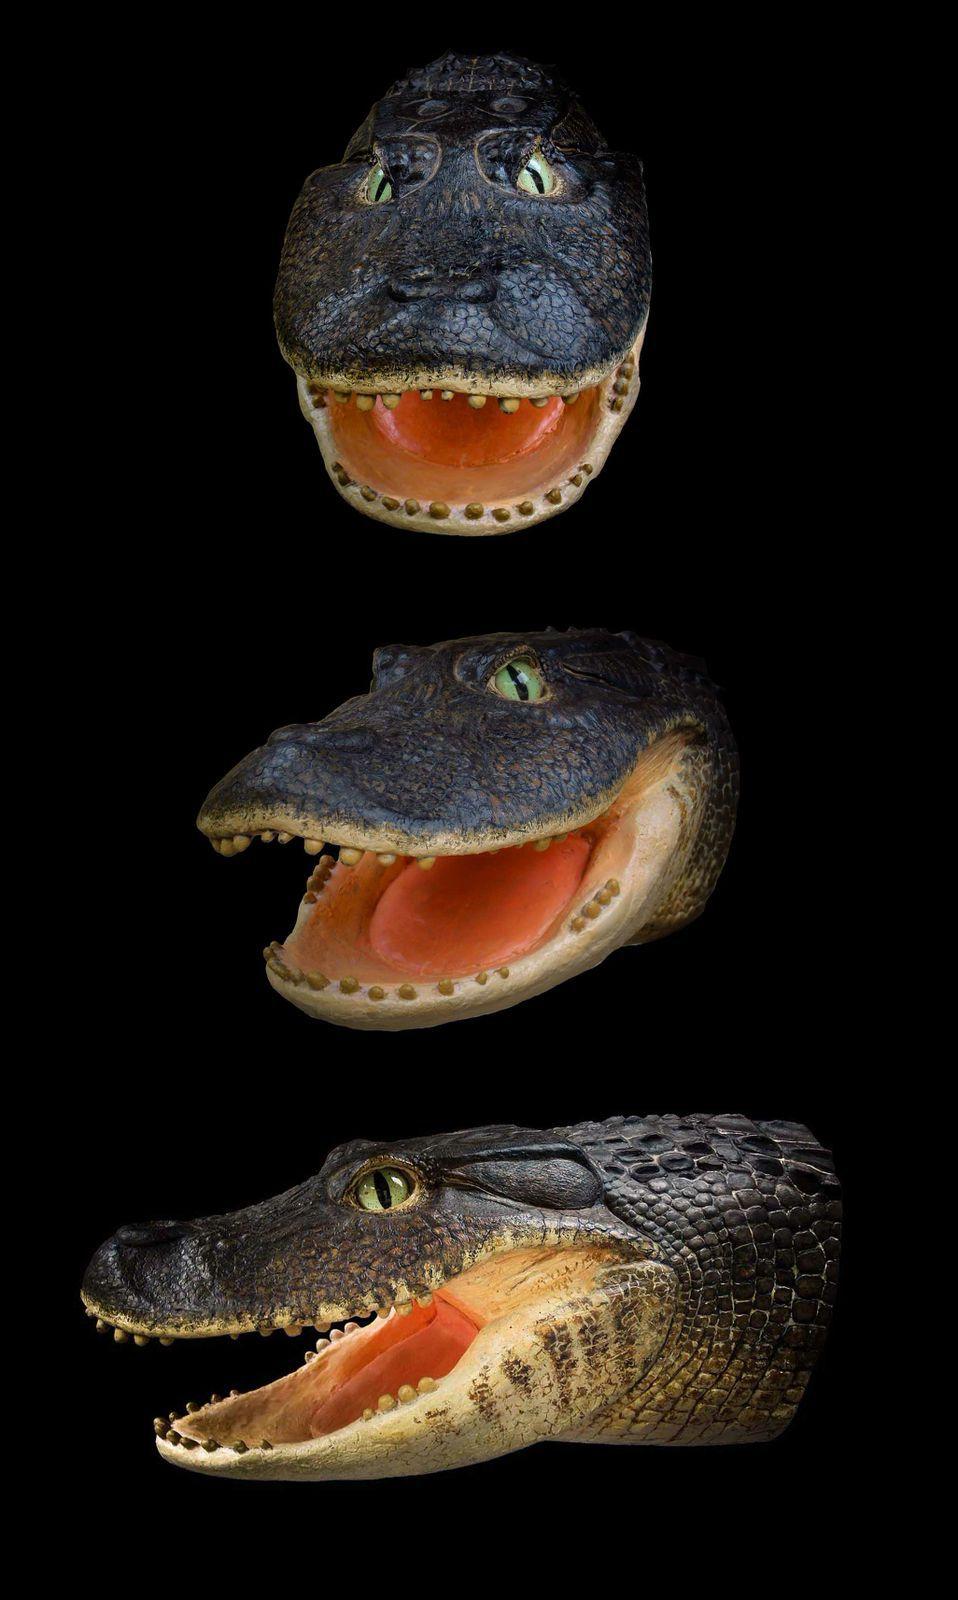 Meet An Adorable Ancient Crocodile That Had Dental